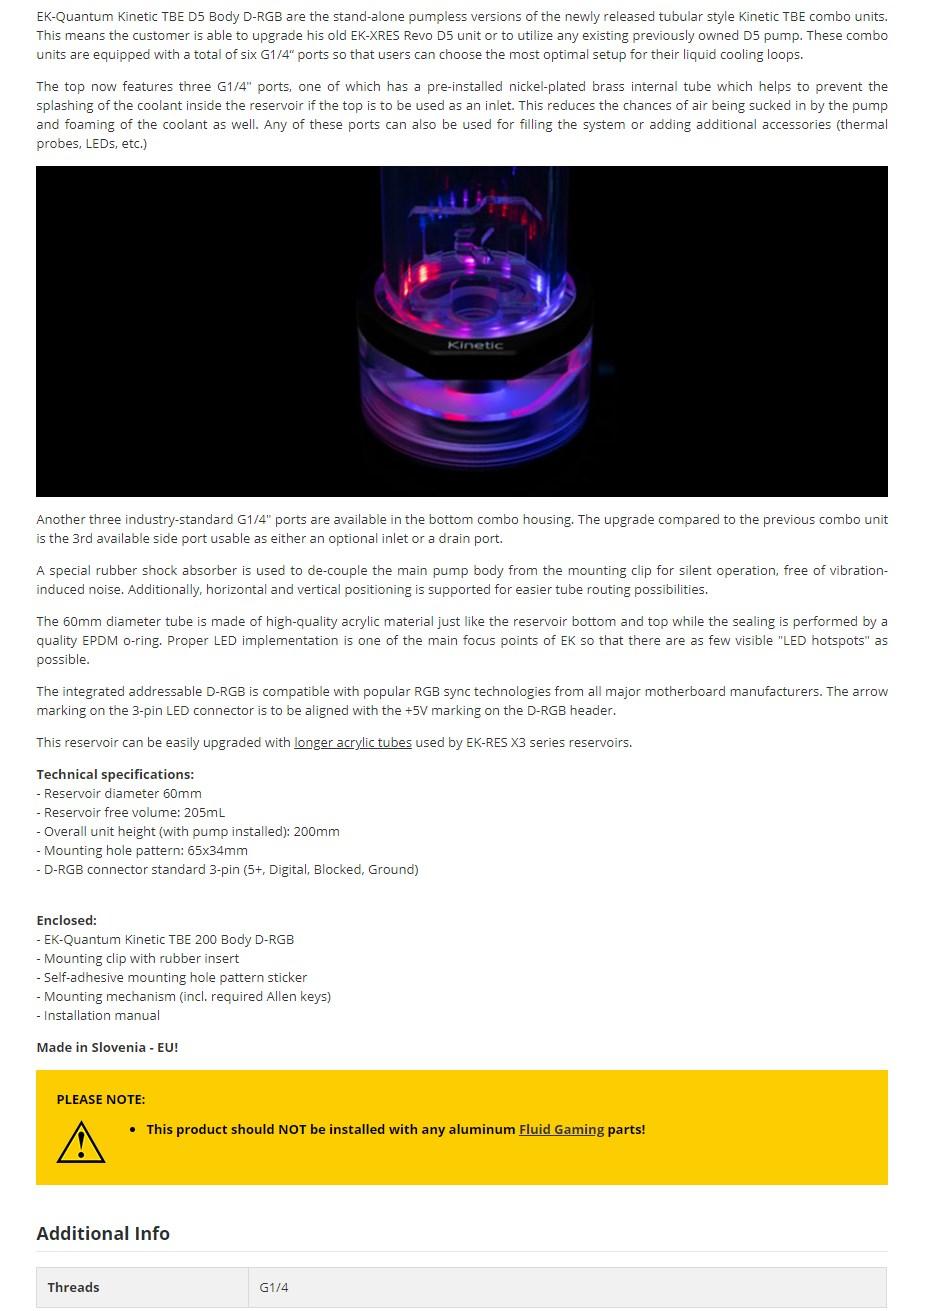 EKWB EK-Quantum Kinetic TBE 200 D5 Body D-RGB Reservoir - Plexi - Overview 1